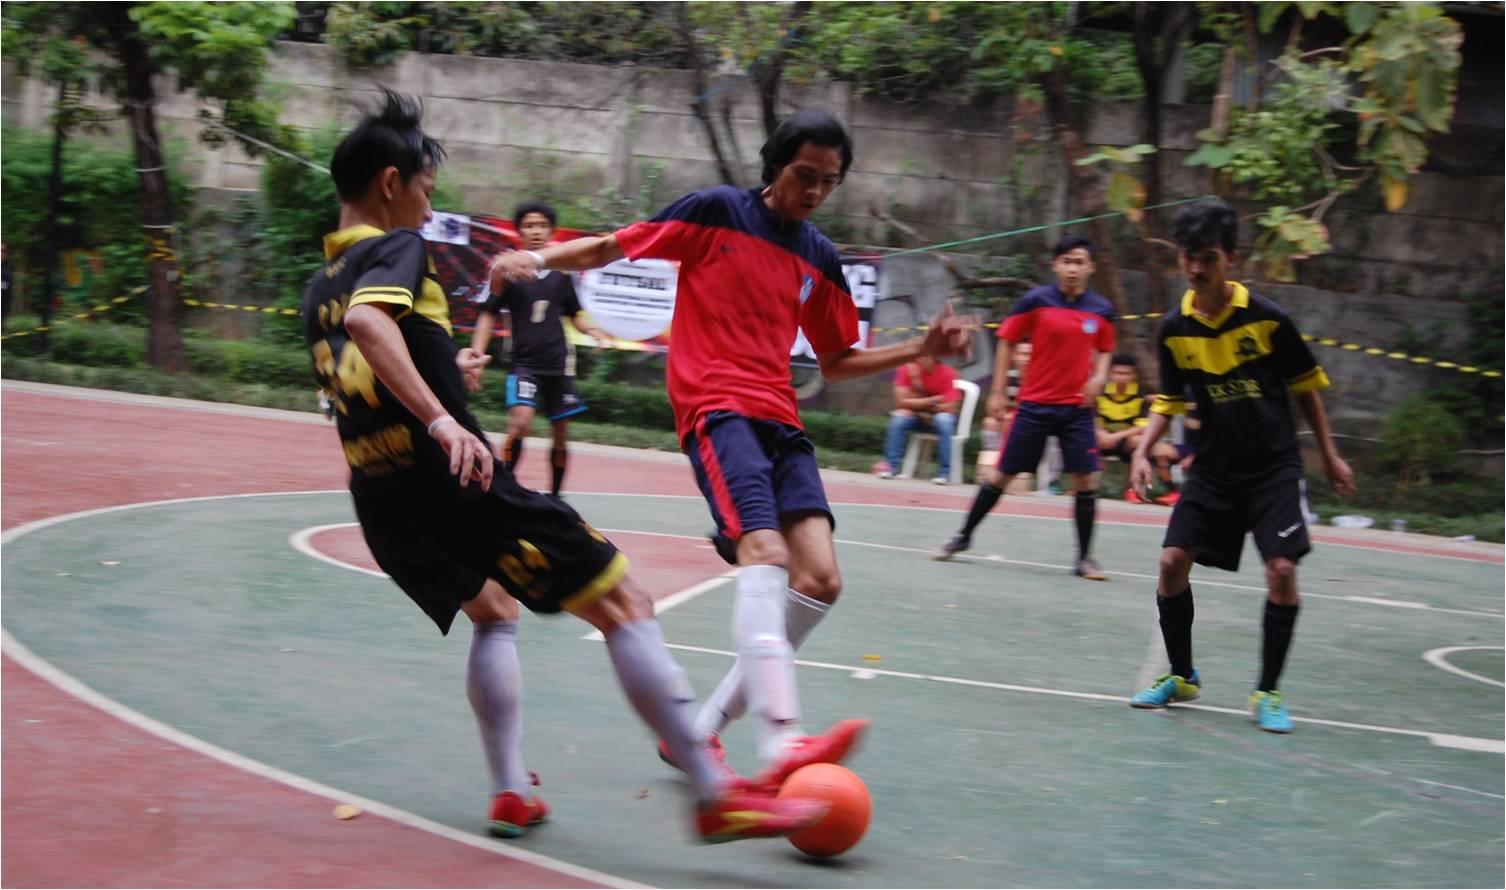 Futsal Kelompok Kerja Studi Akuntansi Universitas Esa Unggul